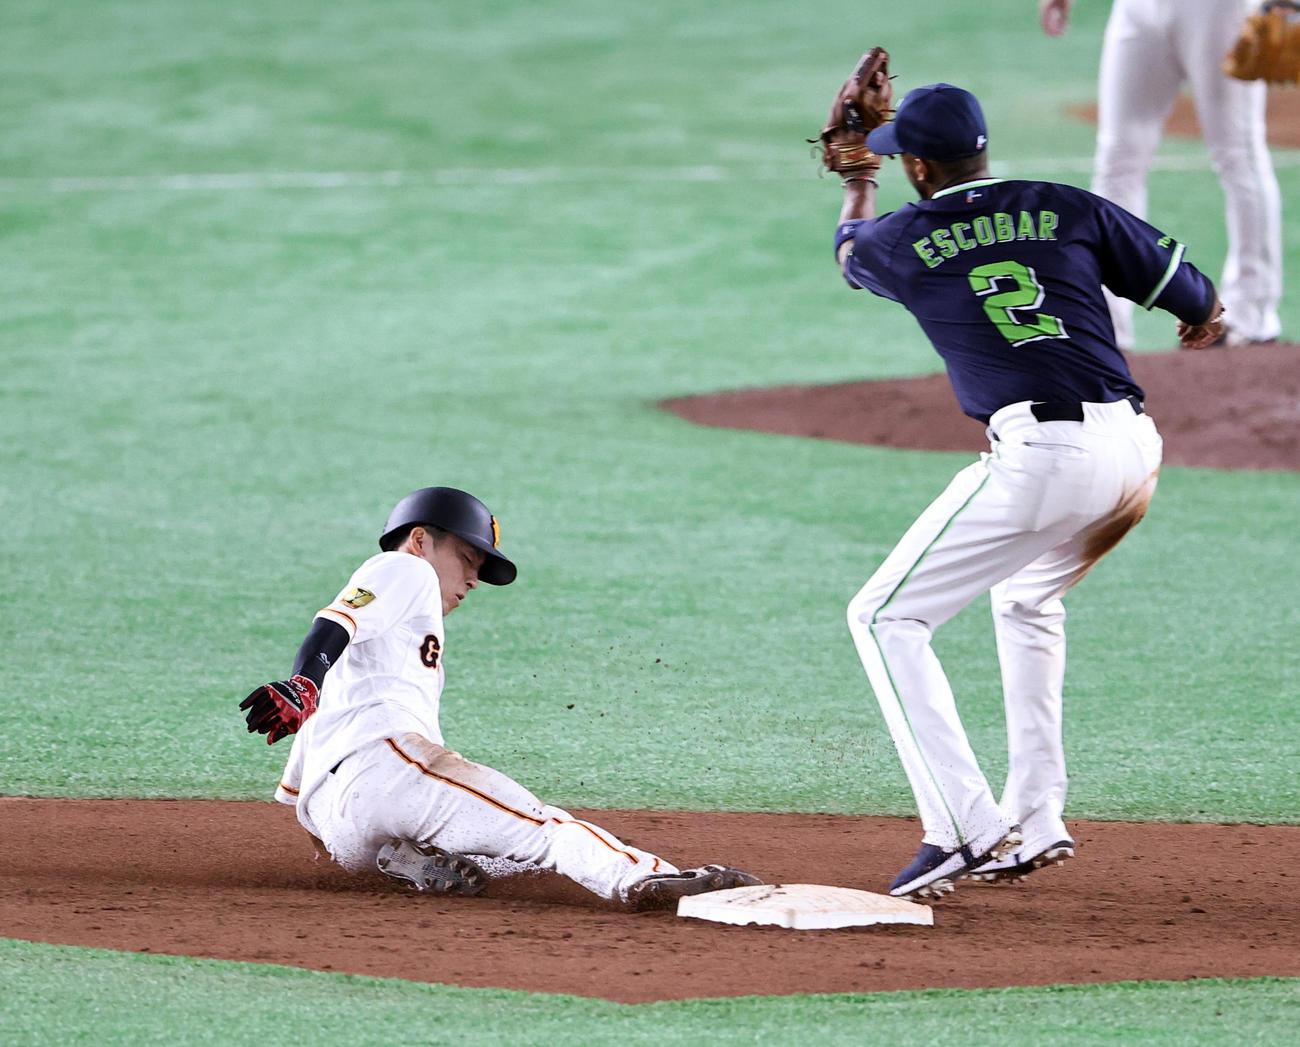 巨人対ヤクルト 9回裏巨人無死一塁、増田大(左)は二塁盗塁成功(撮影・浅見桂子)